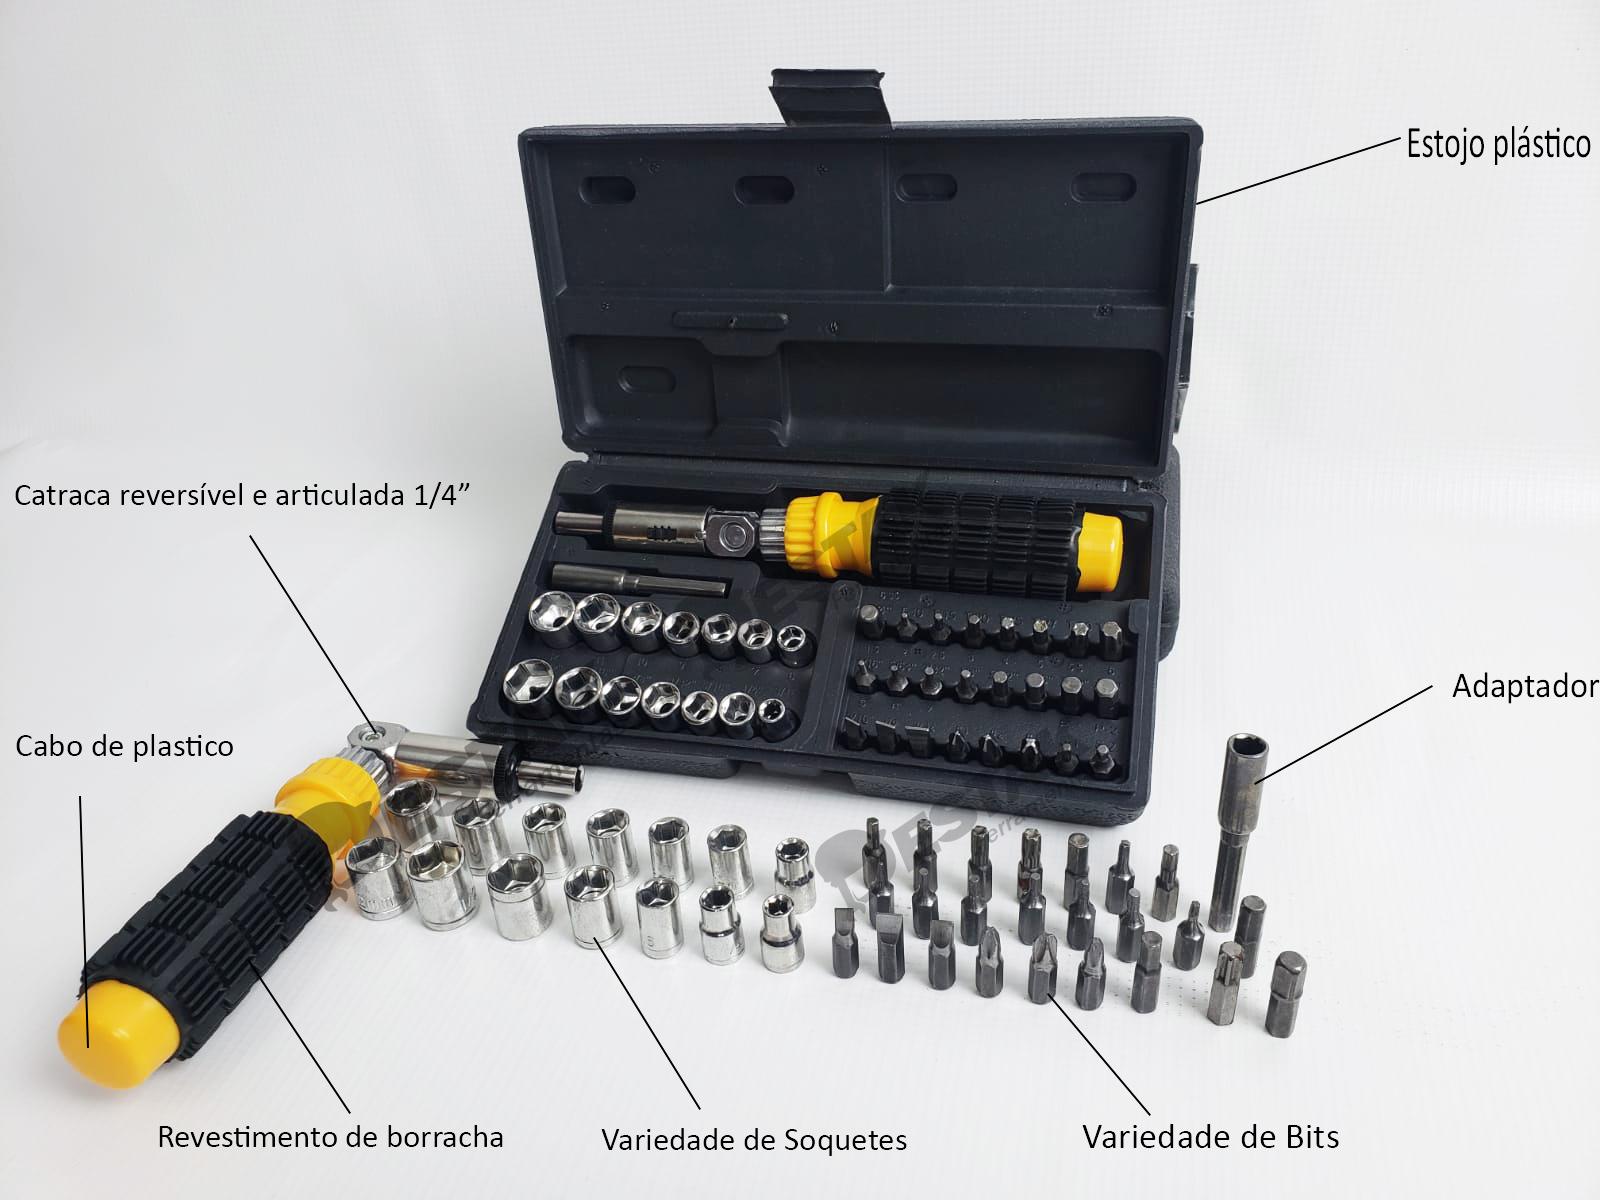 Estojo Kit 40 Ferramentas Chave Catraca E Soquetes + Allen